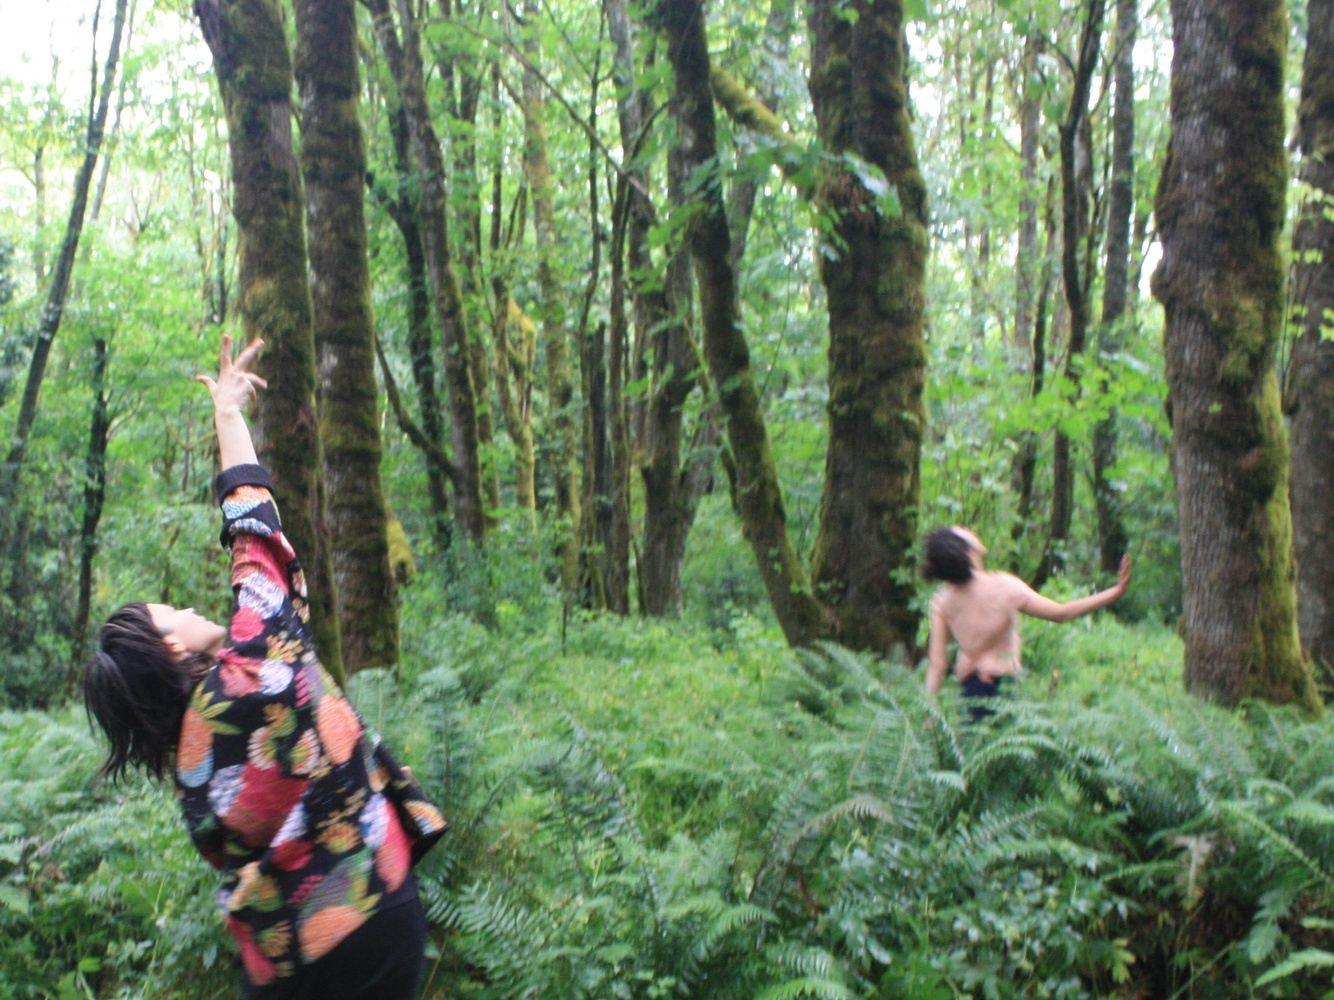 Rewilding: A Summer Retreat with Tahni Holt and Suniti Dernovsek